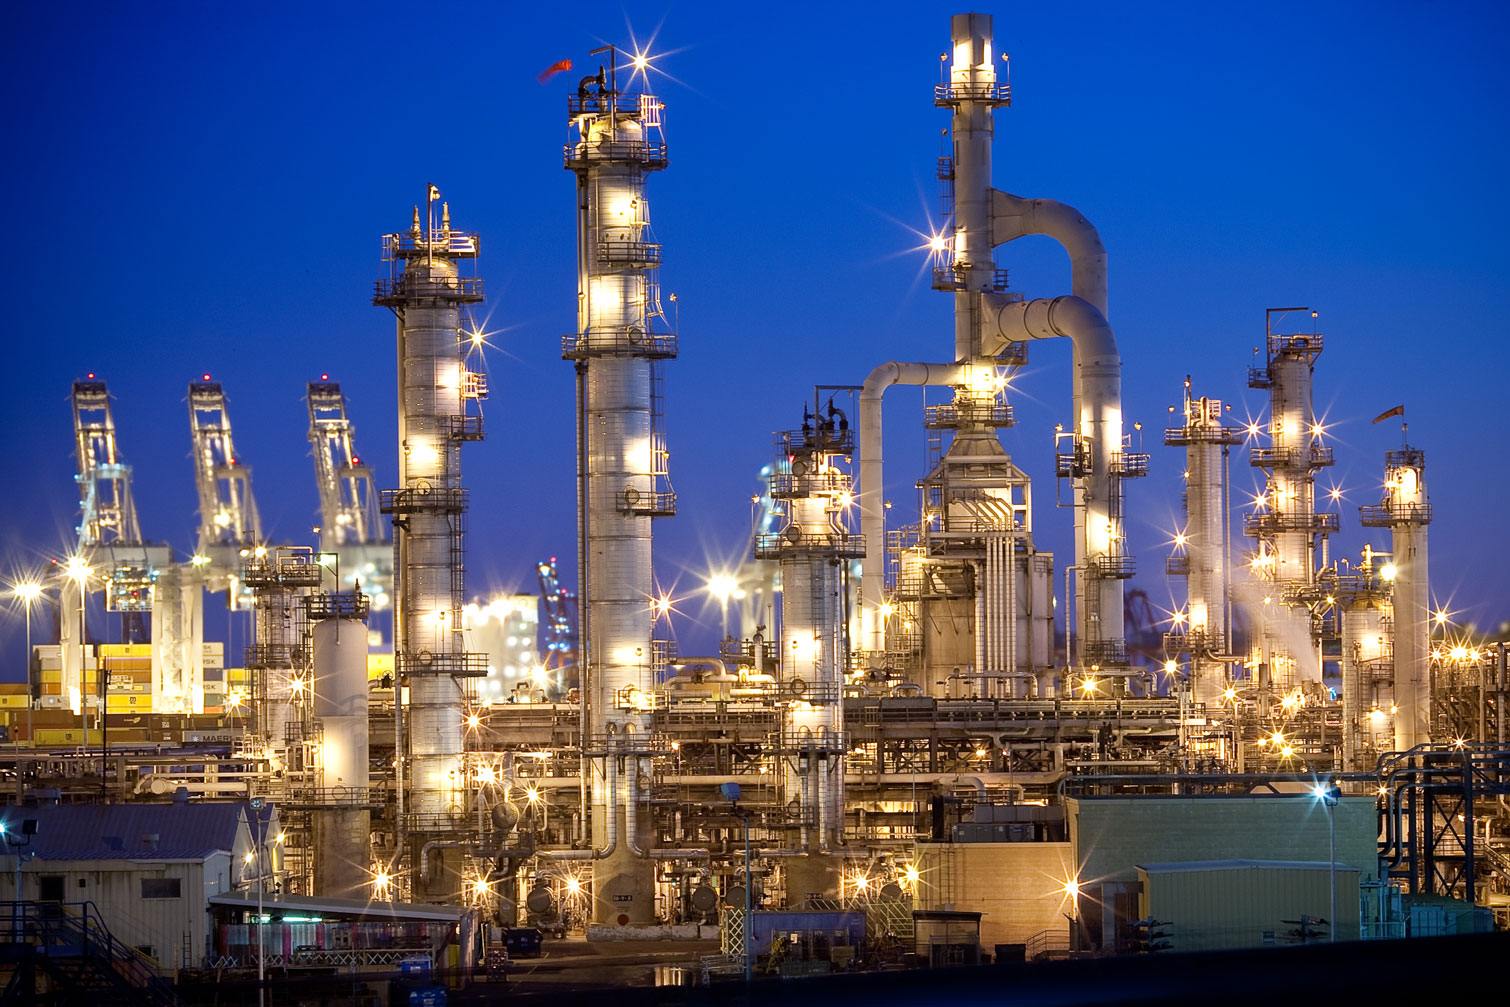 Tesoro refinery in Carson